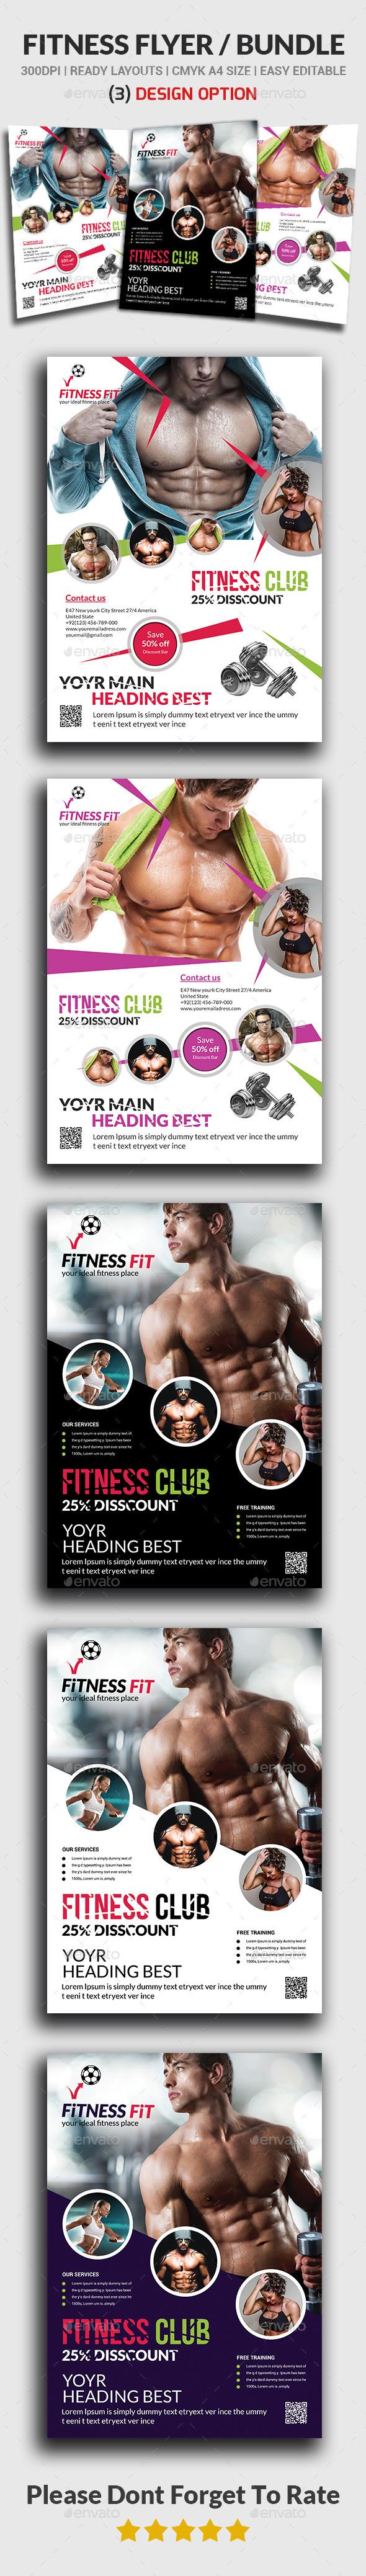 Fitness Flyer Bundle